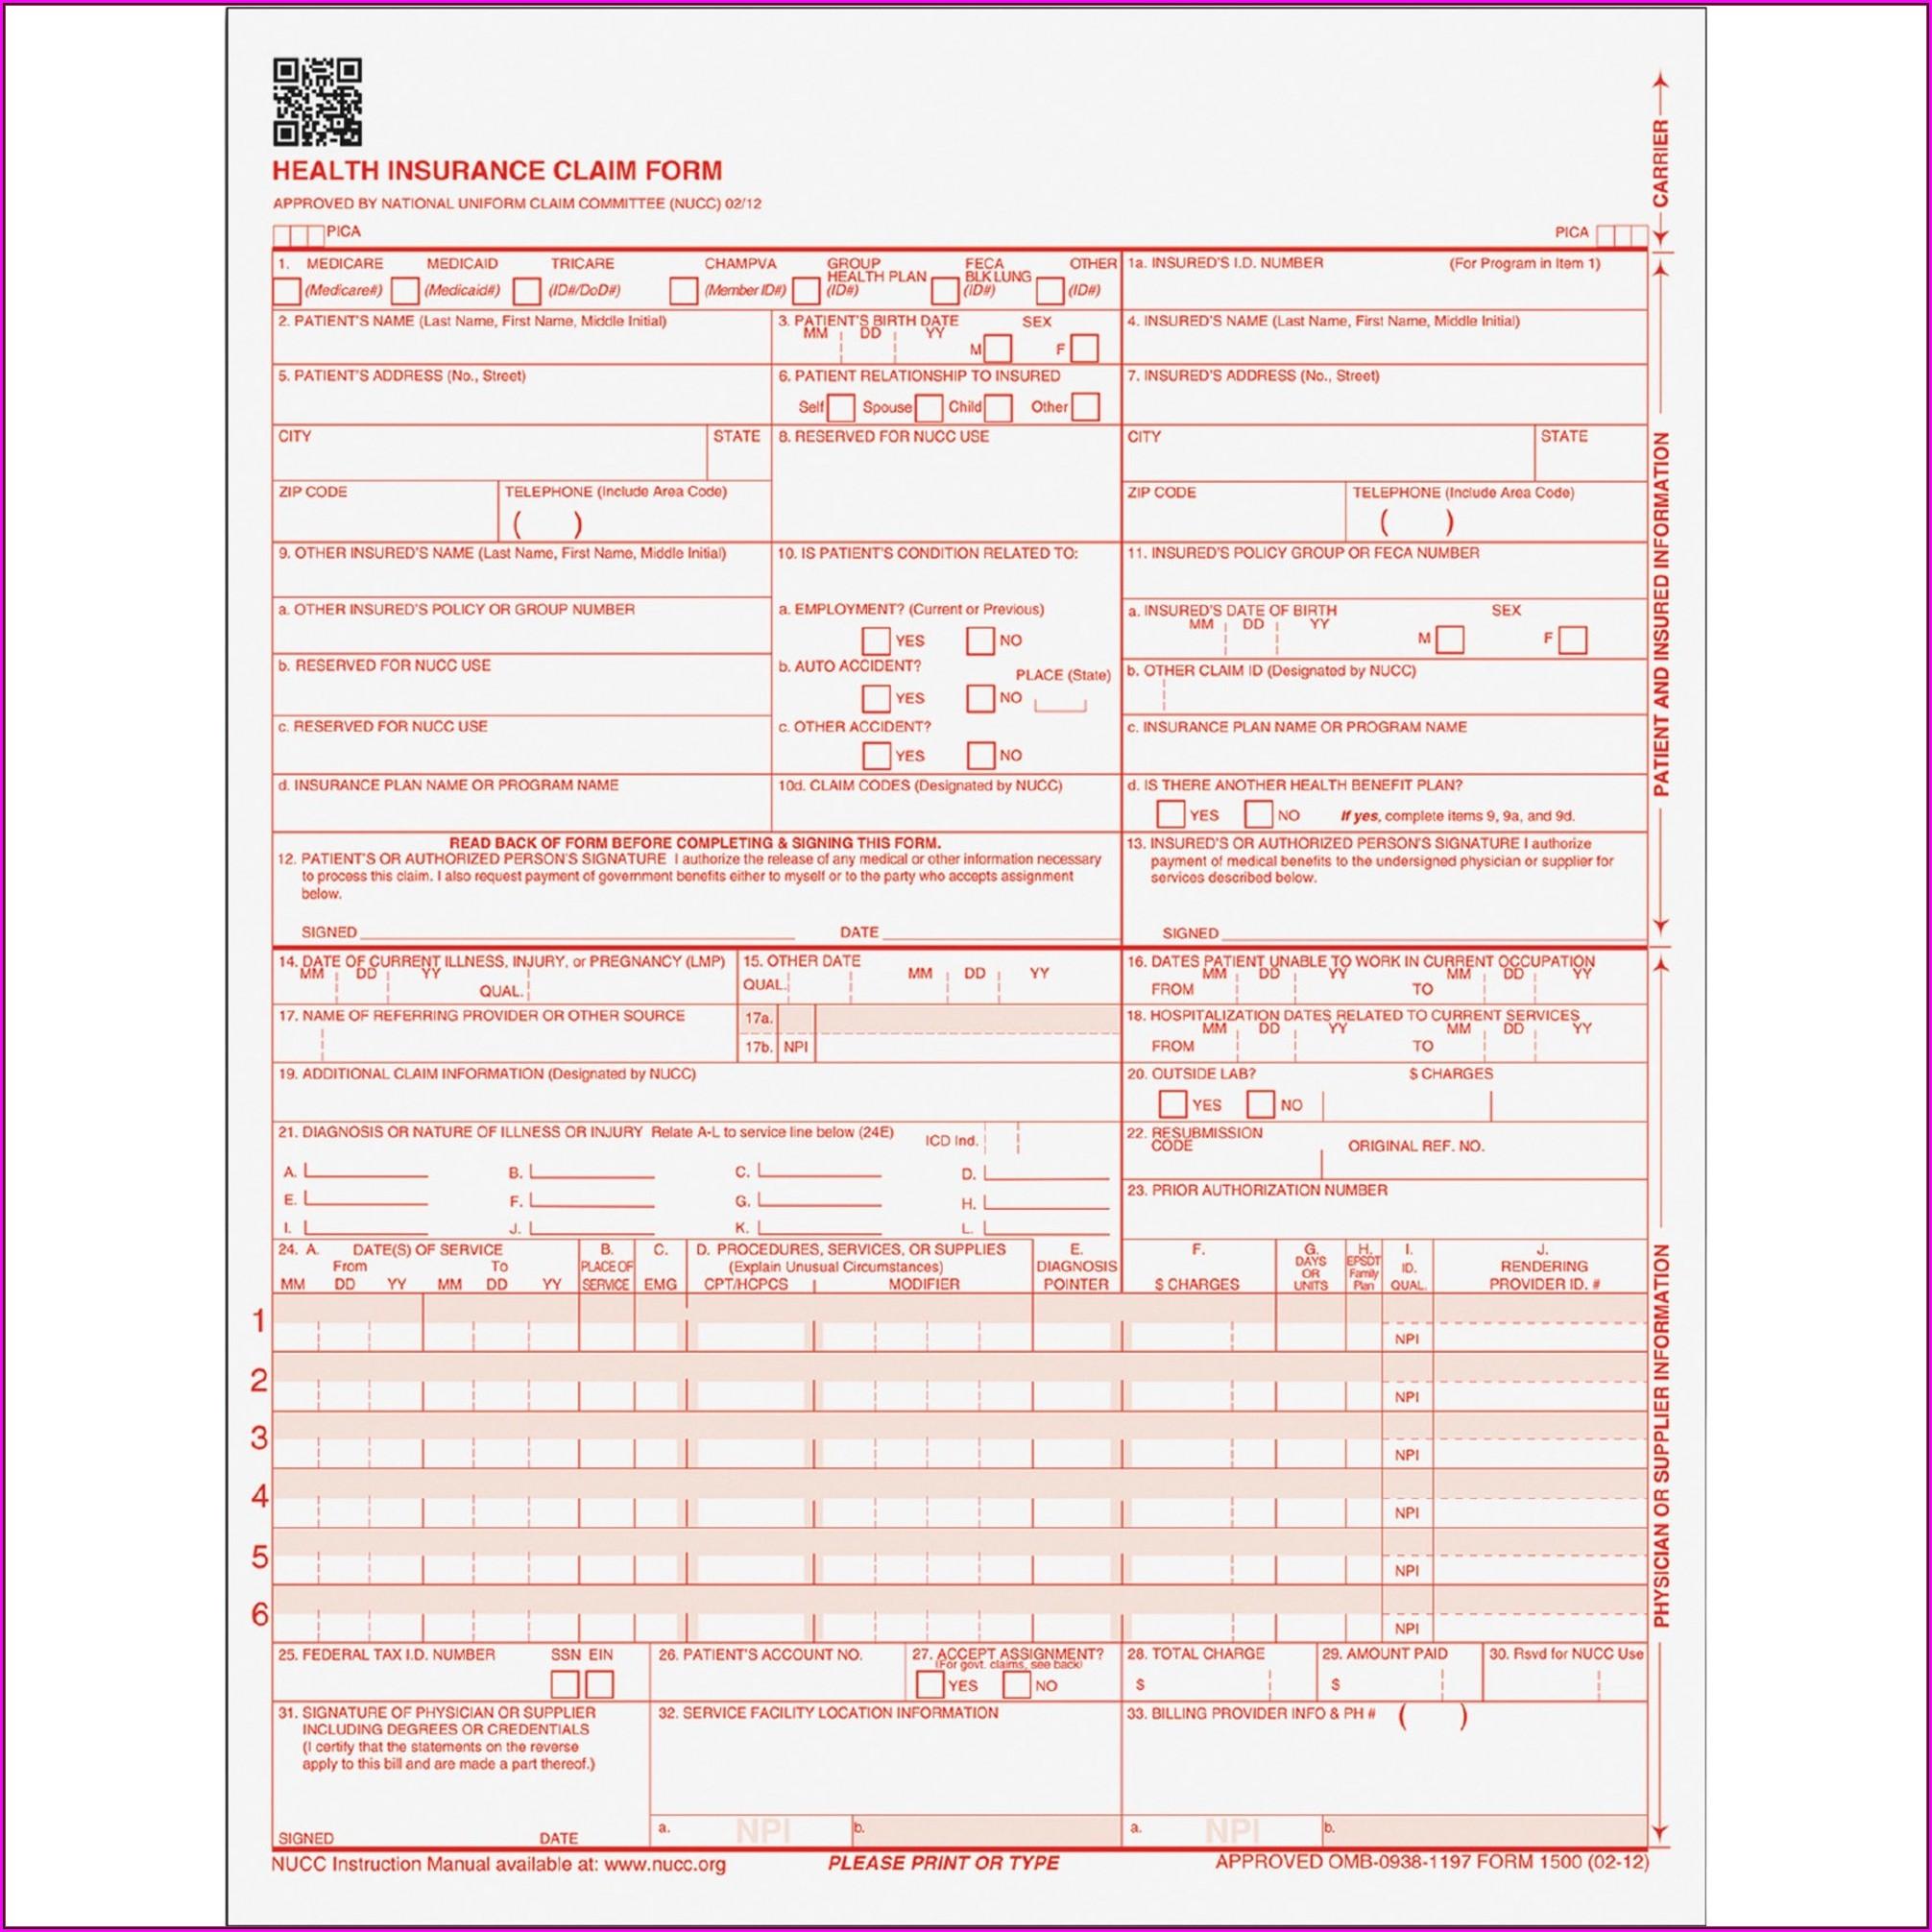 Hcfa Forms Online Free